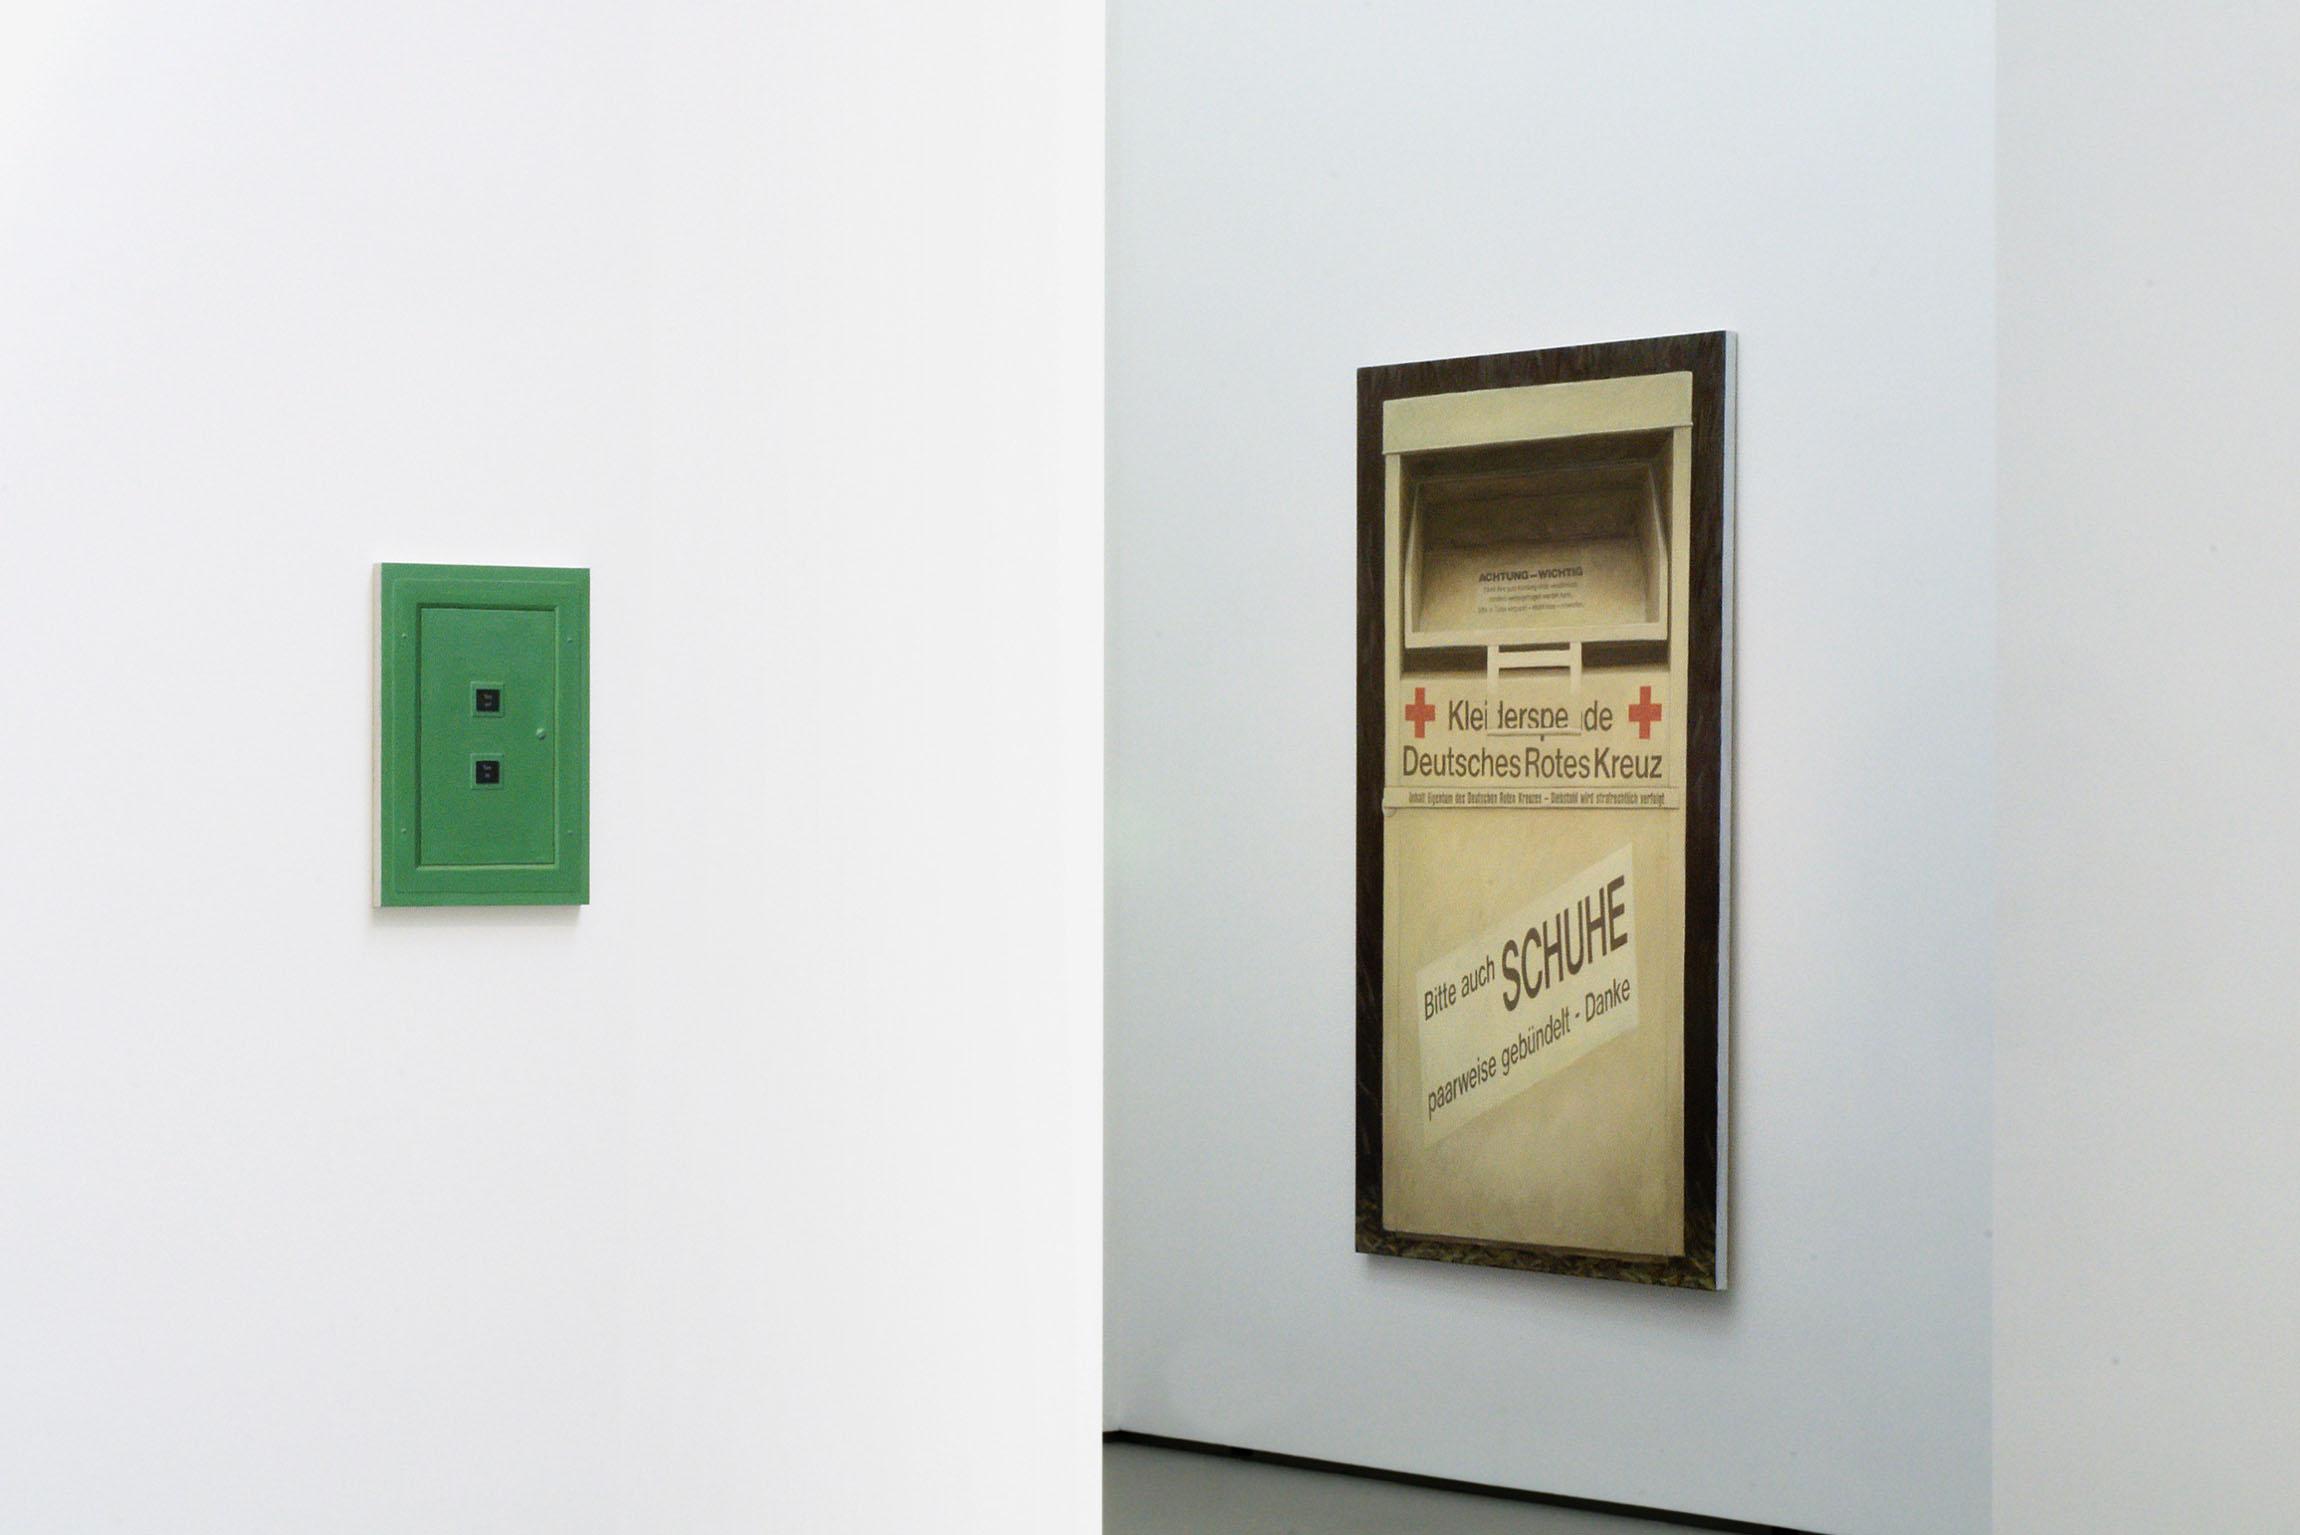 2012 Christoph Hänsli Mortadella and Other Works